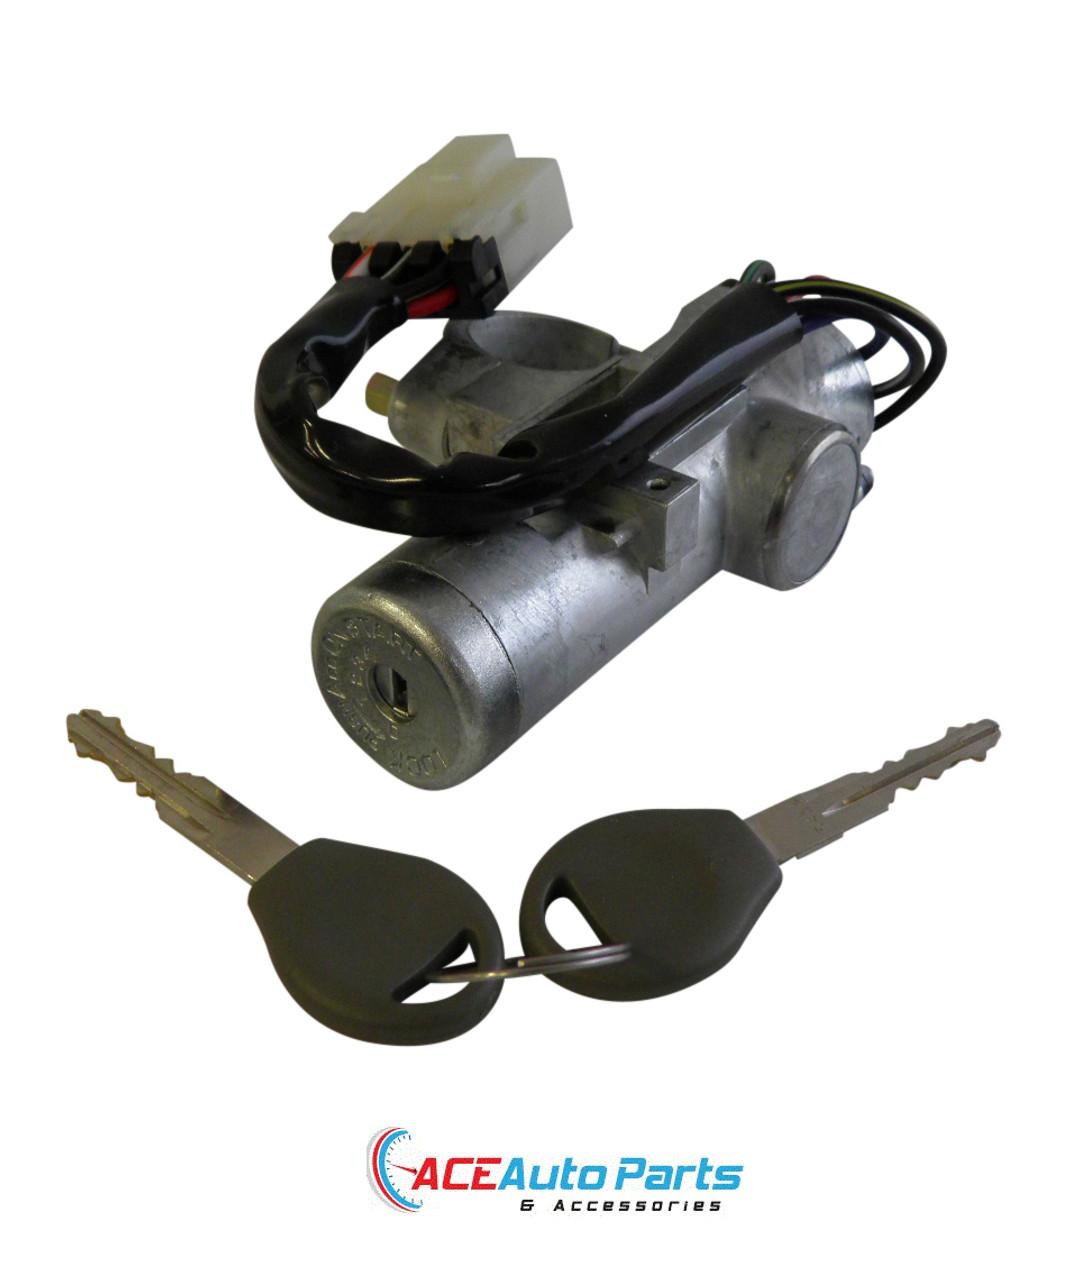 Ignition barrel switch For Nissan Navara D22